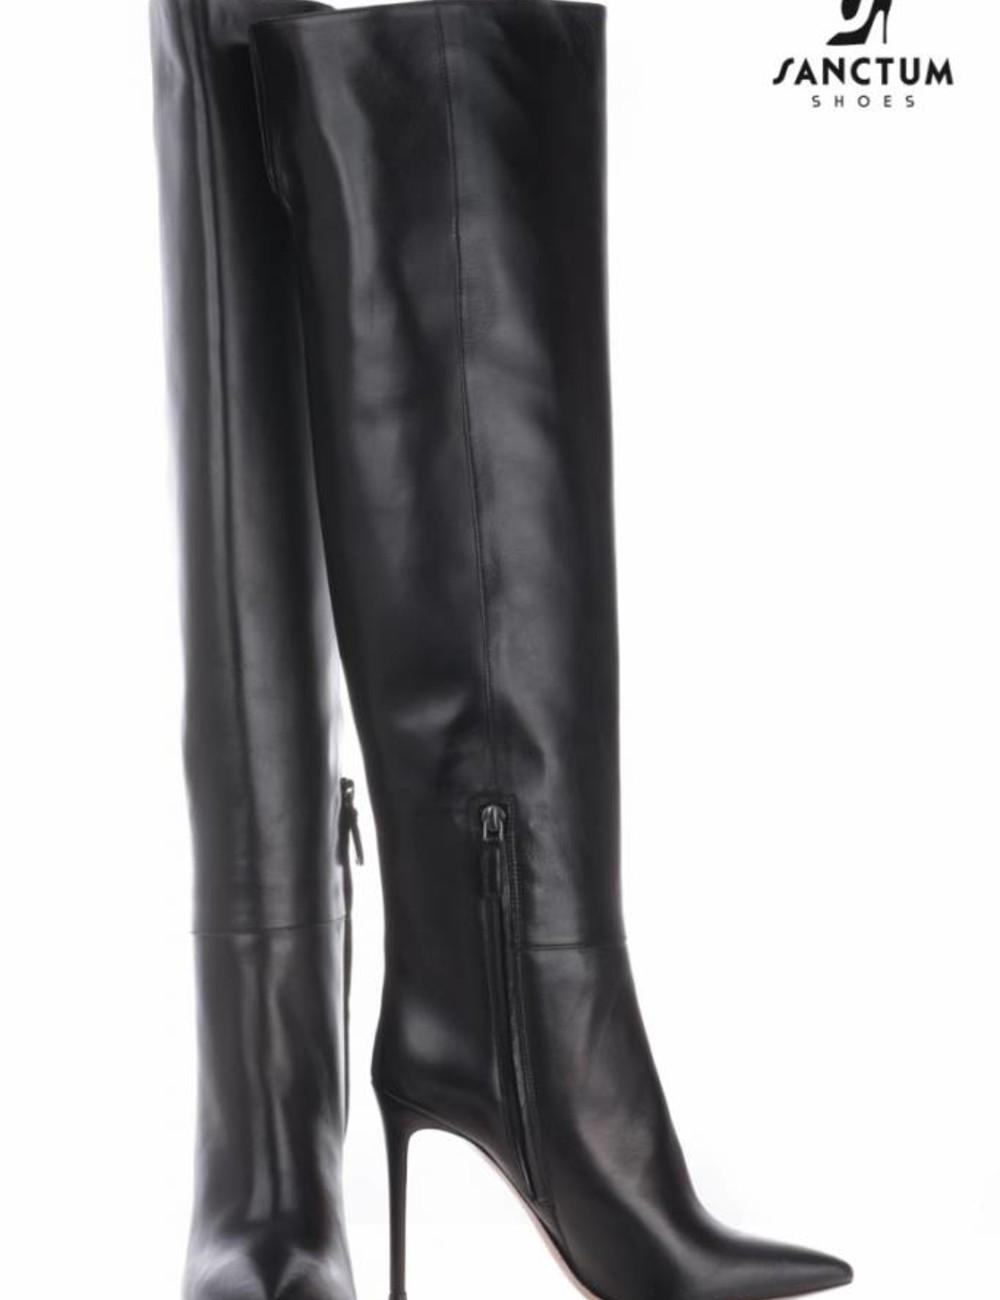 Sanctum  Long Italian thigh high boots with thin heels